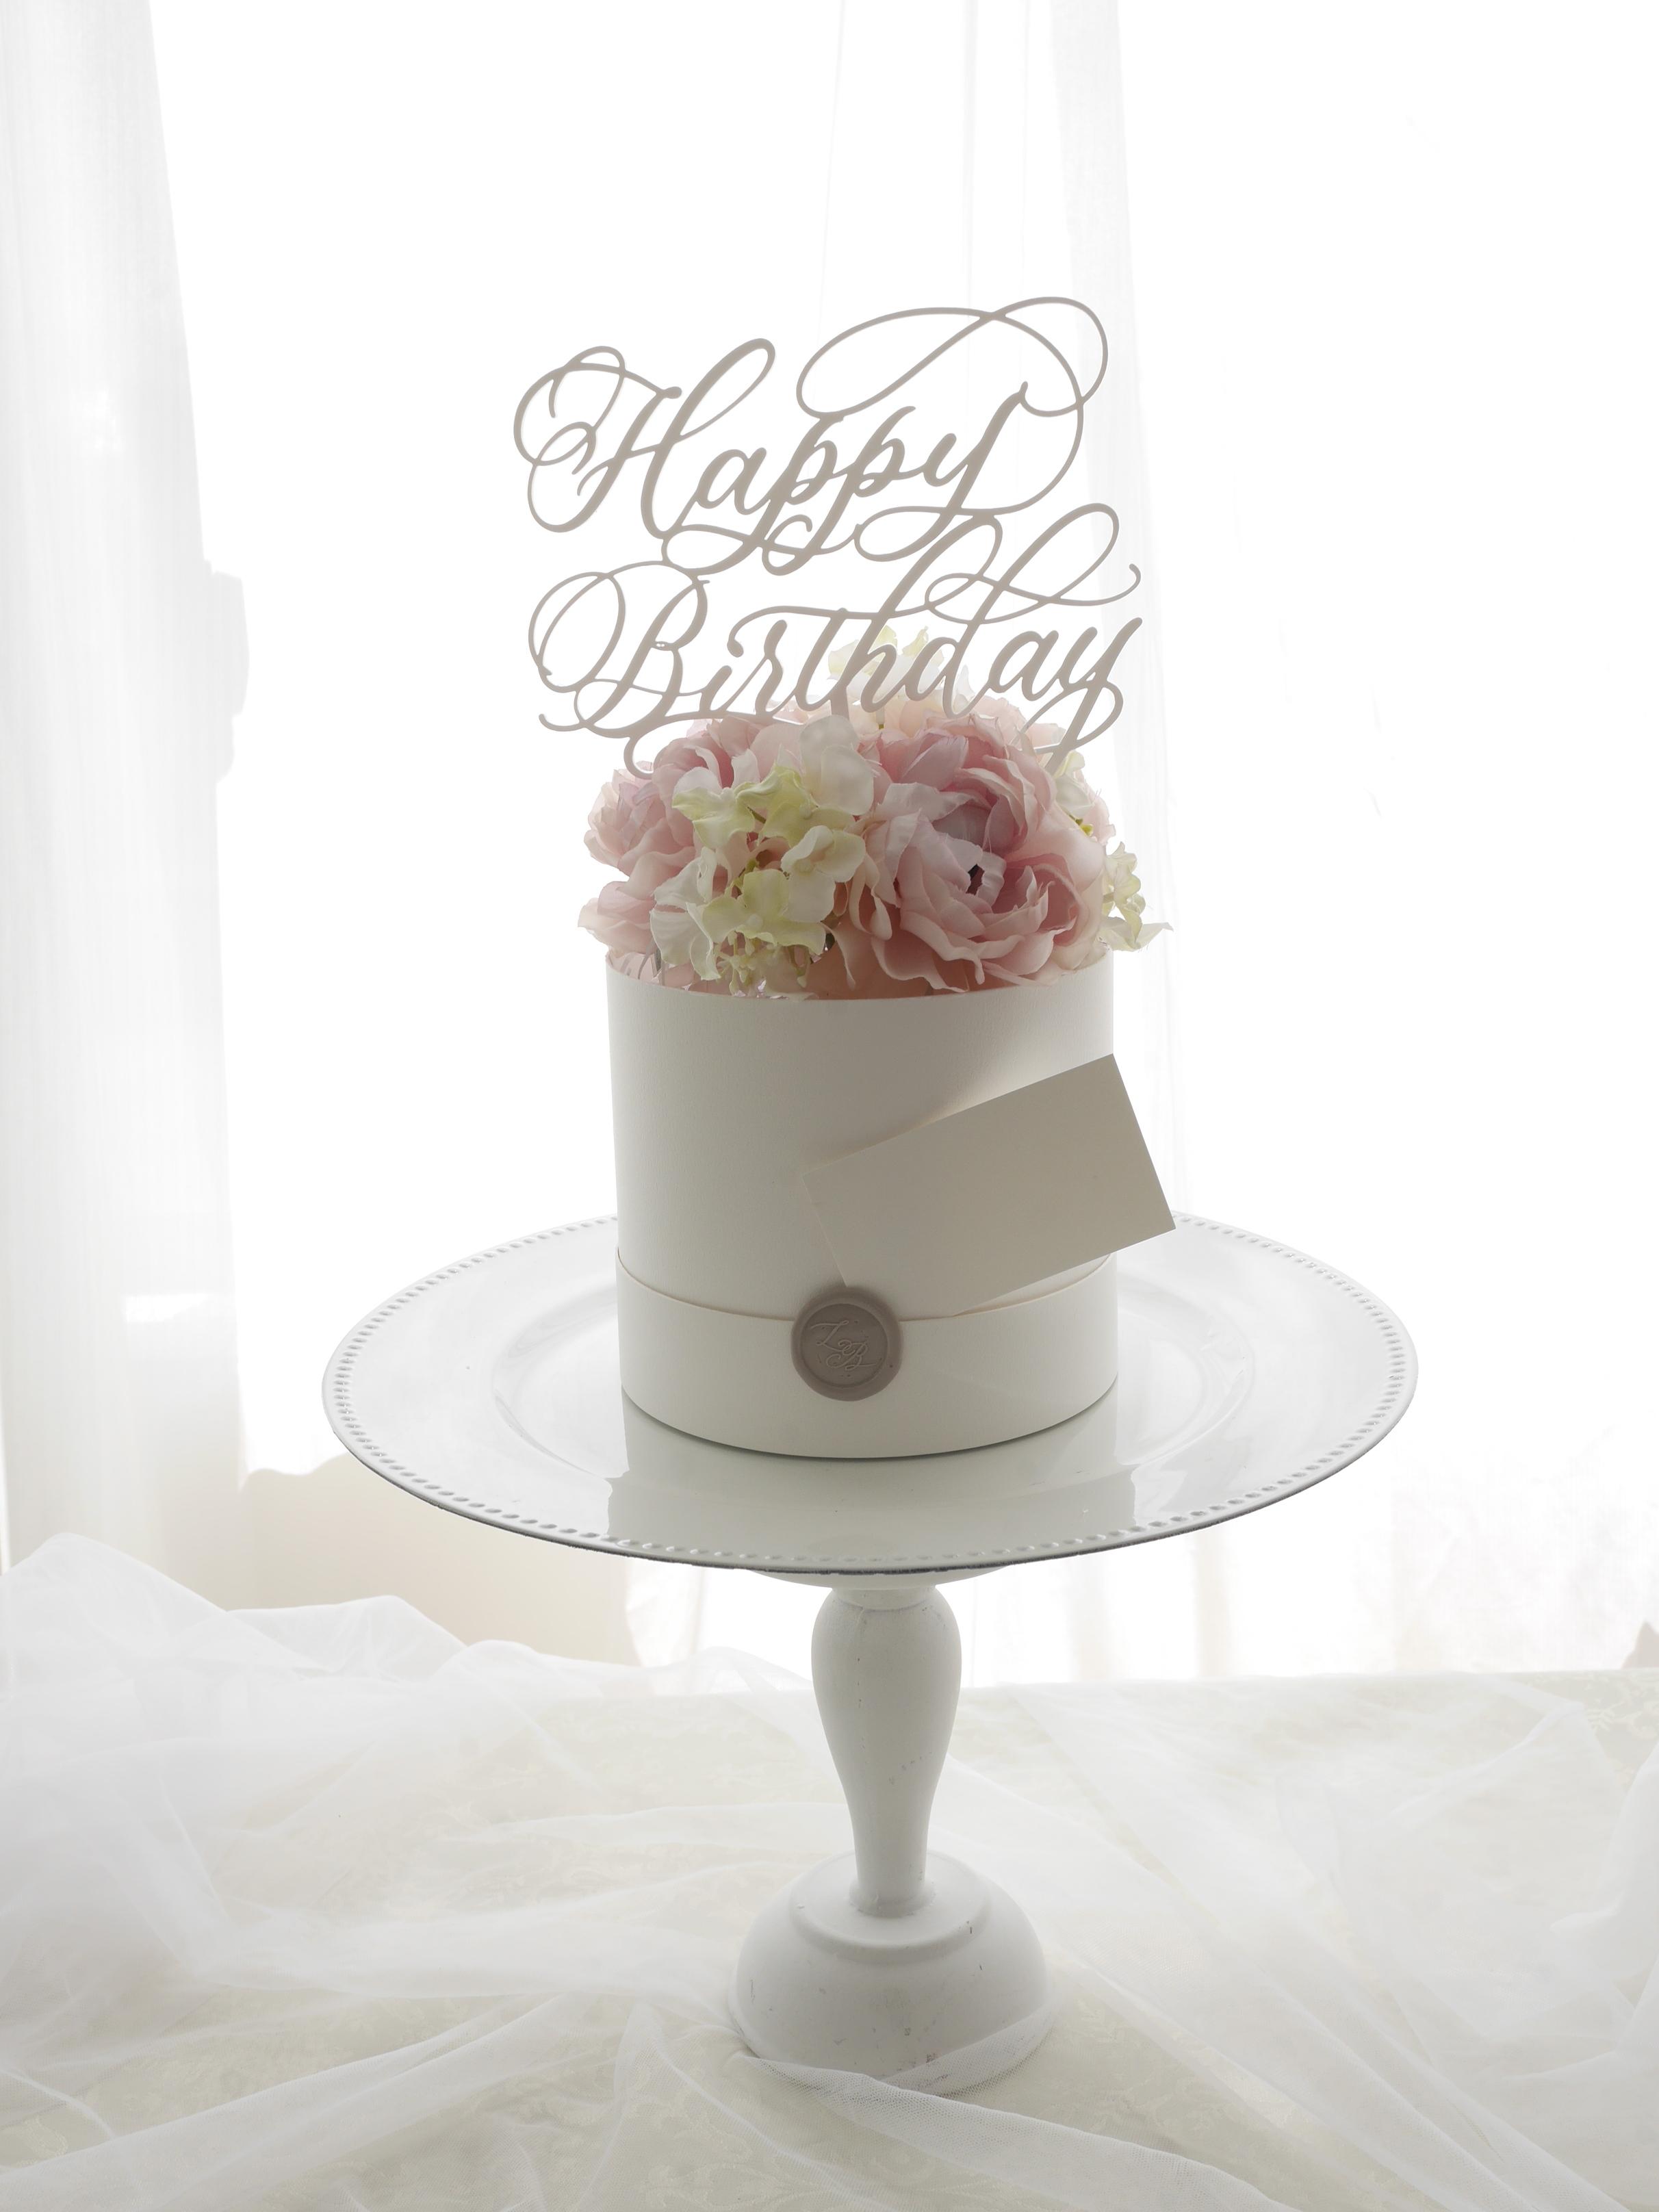 Anniversaryオリジナルケーキトッパー